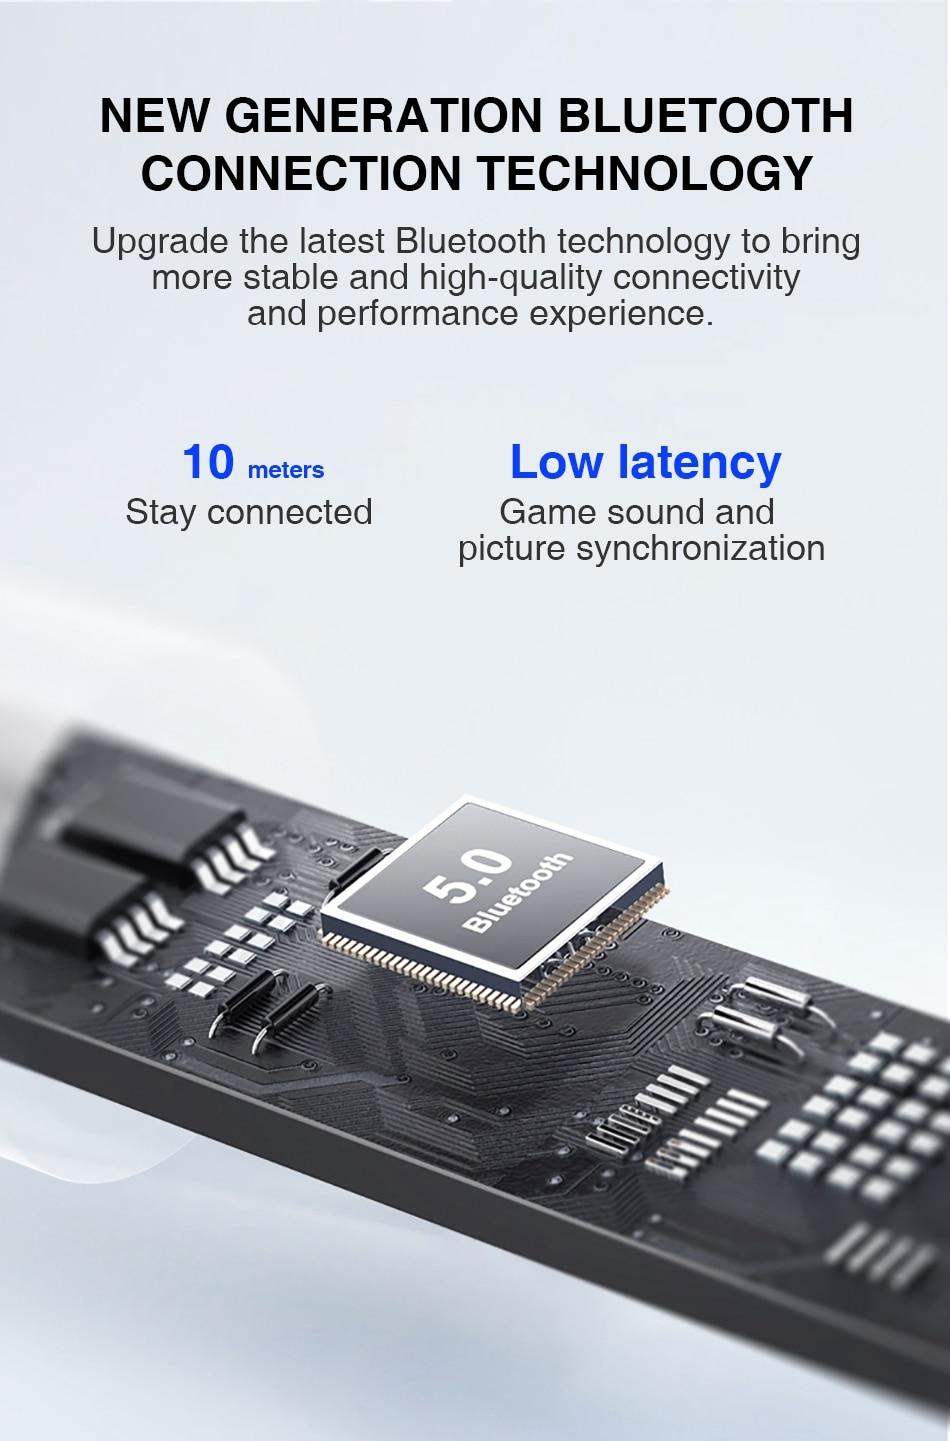 Lenovo LP40 TWS Wireless Bluetooth Earbuds 9